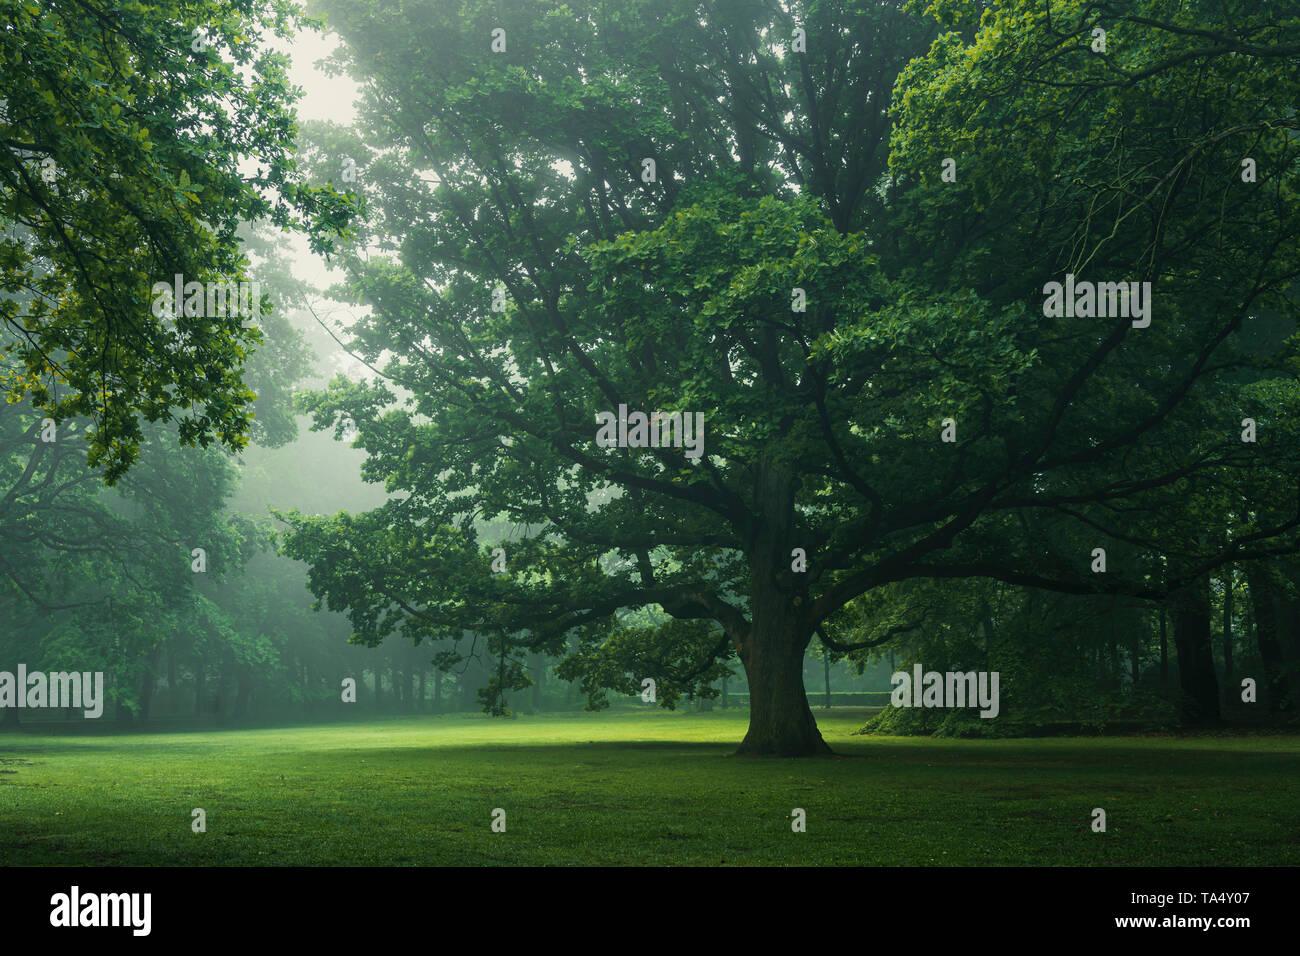 Monumantal tree in the Tiergarten, Berlin largest inner city park, engulfed in morning fog. Stock Photo